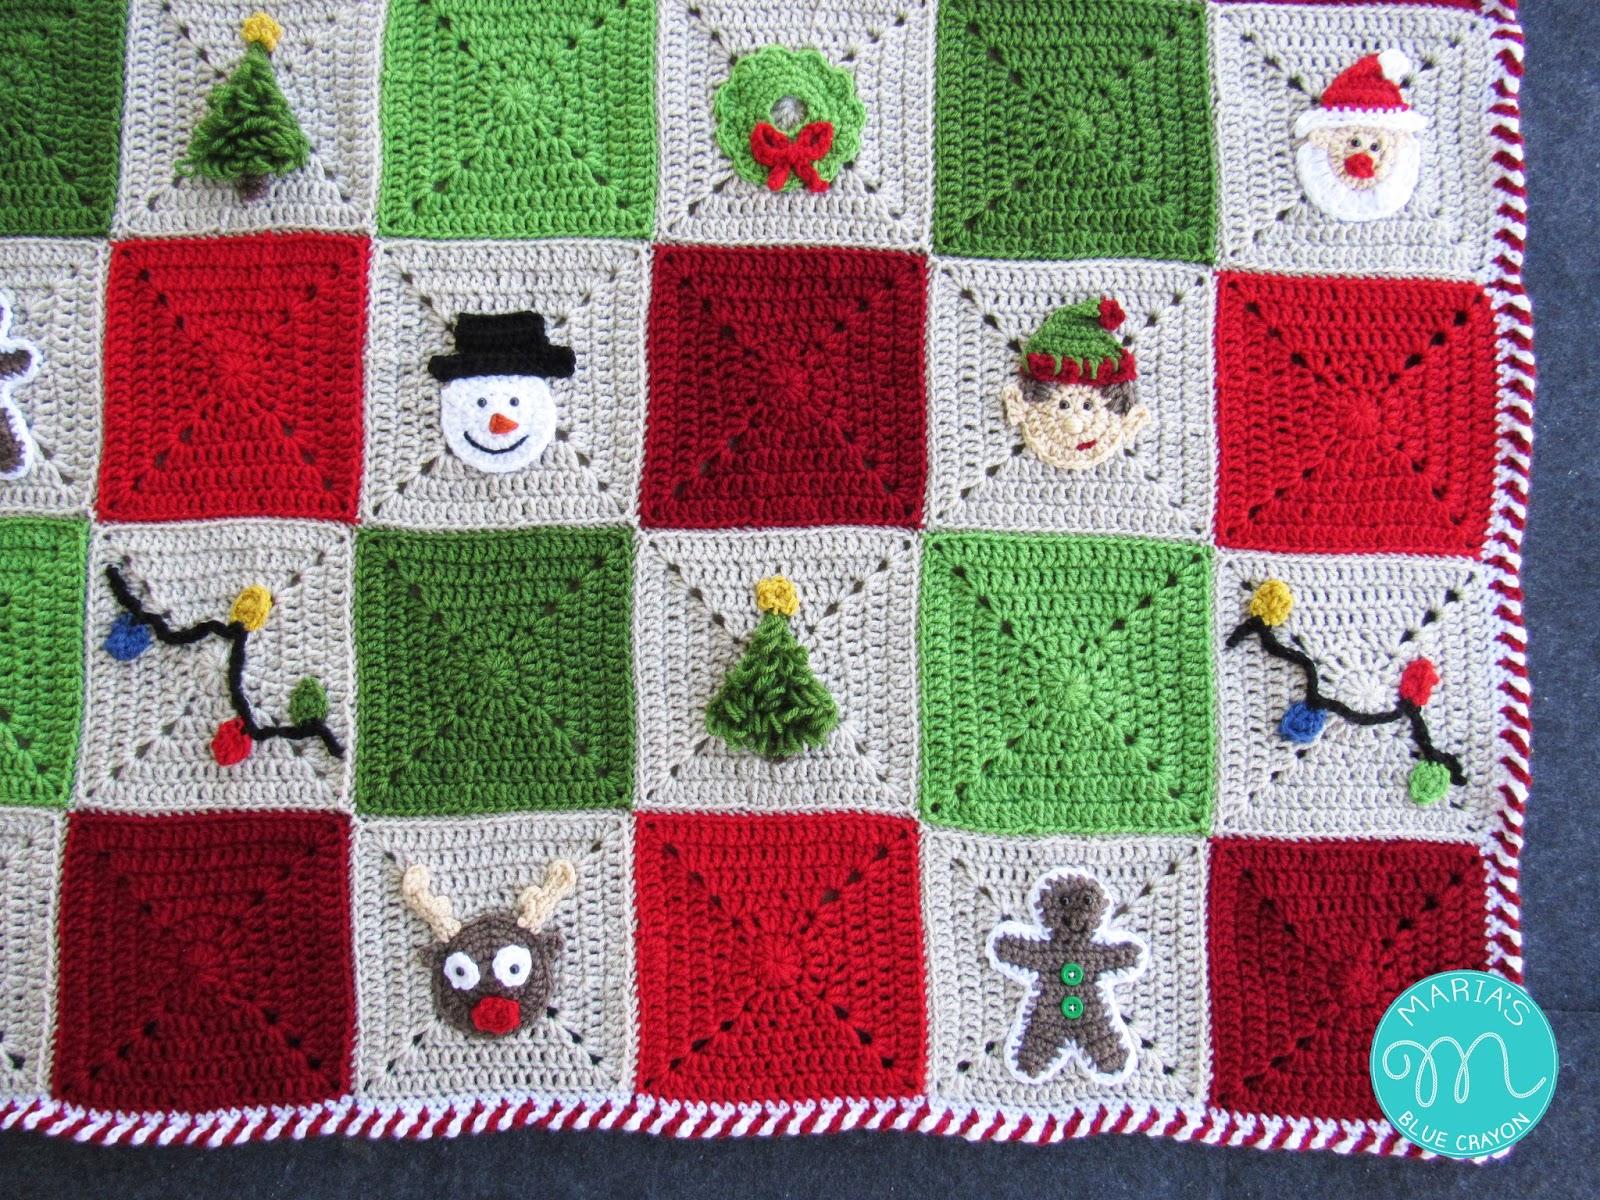 Crochet Candy Cane Stripe Border Crochet Photo Video Tutorial